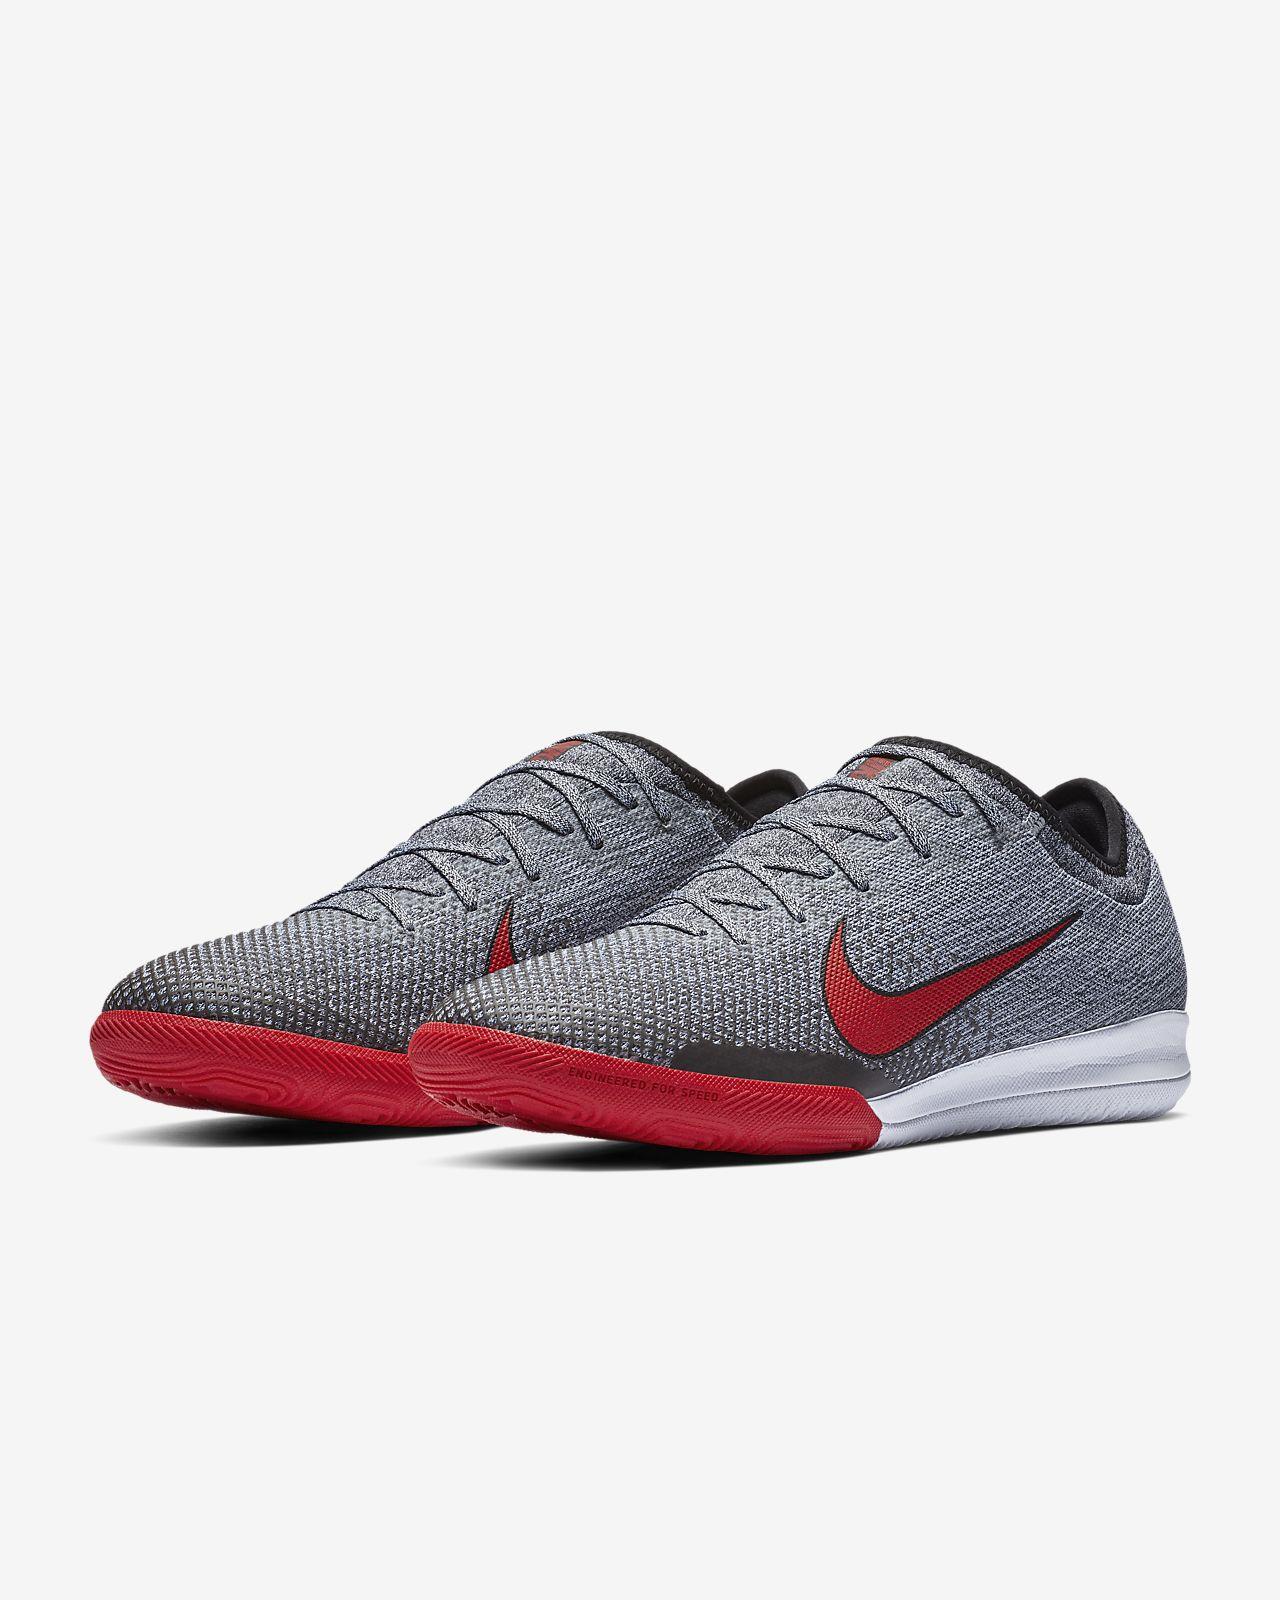 07ea33c25d0bb Sapatilhas de futsal Nike MercurialX Vapor XII Pro Neymar. Nike.com PT